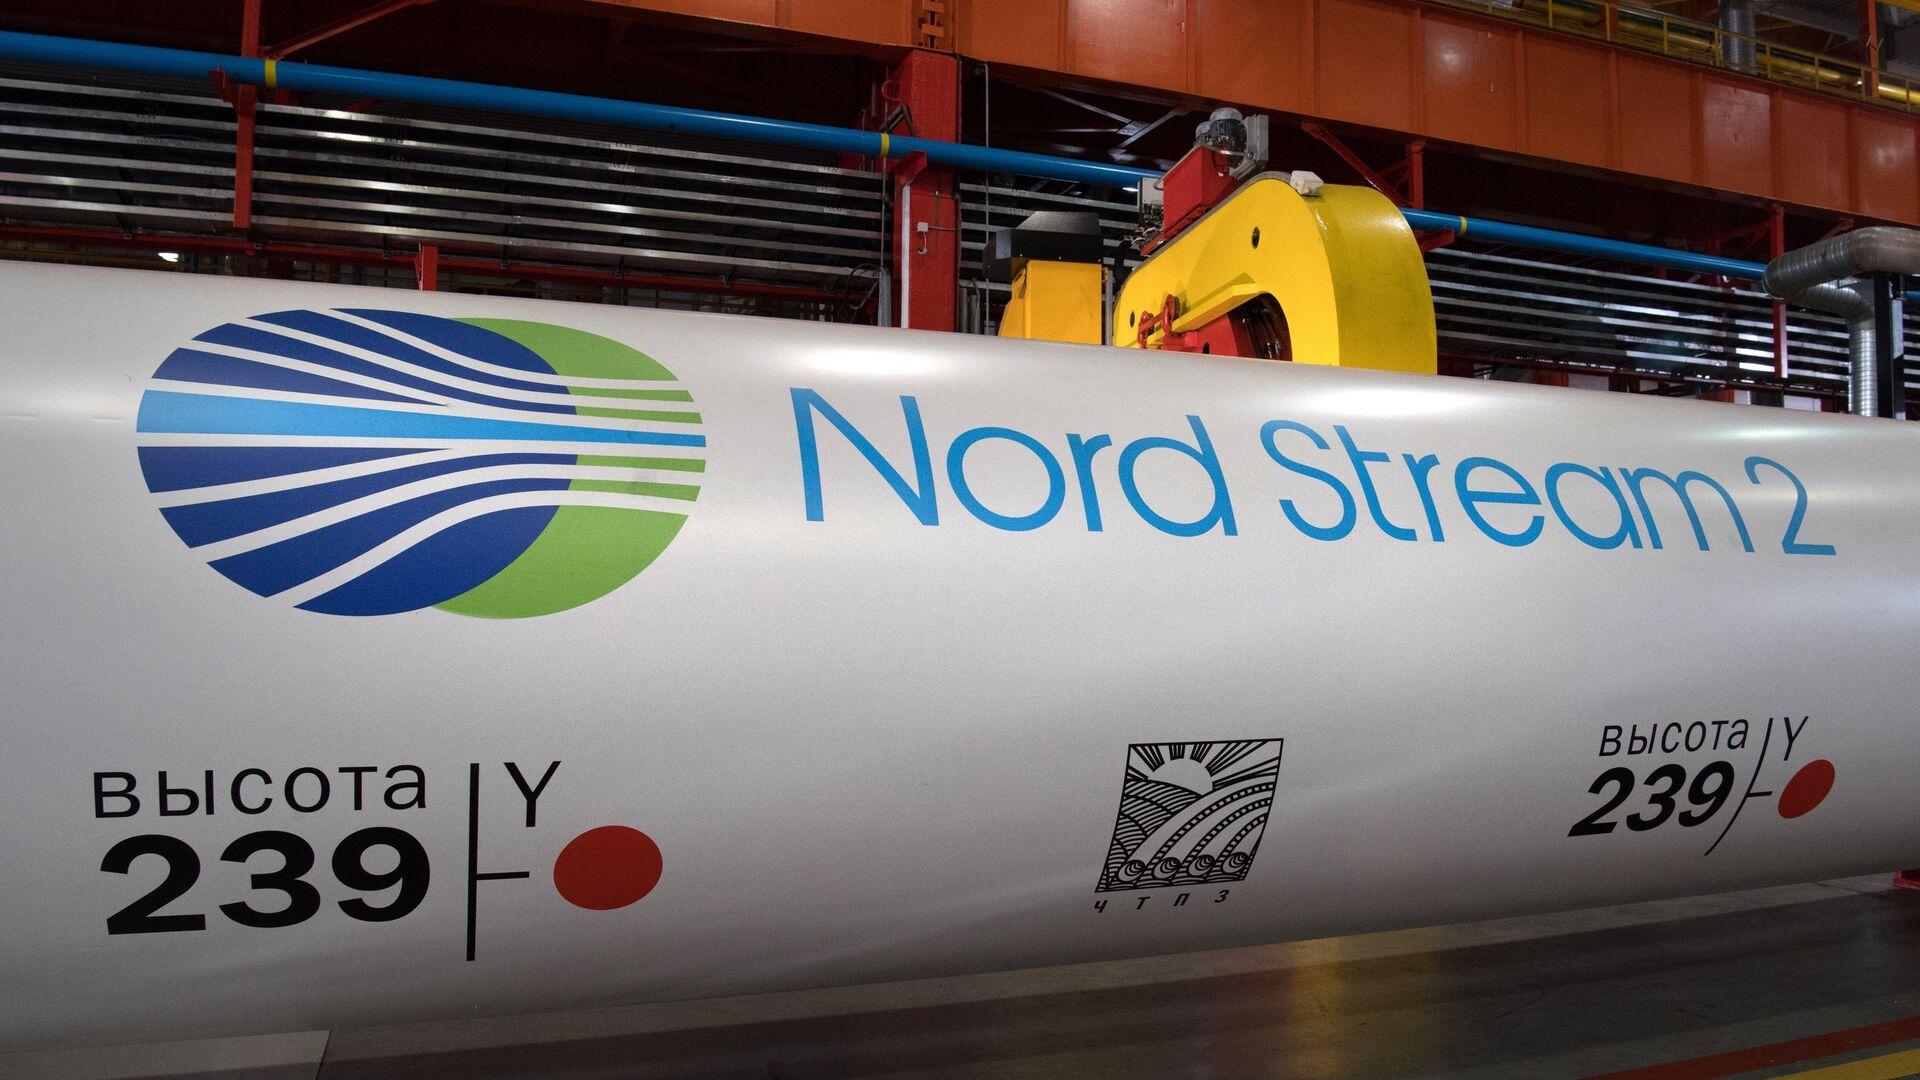 Nord Stream 2 gas pipeline construction project - Sputnik International, 1920, 25.09.2021